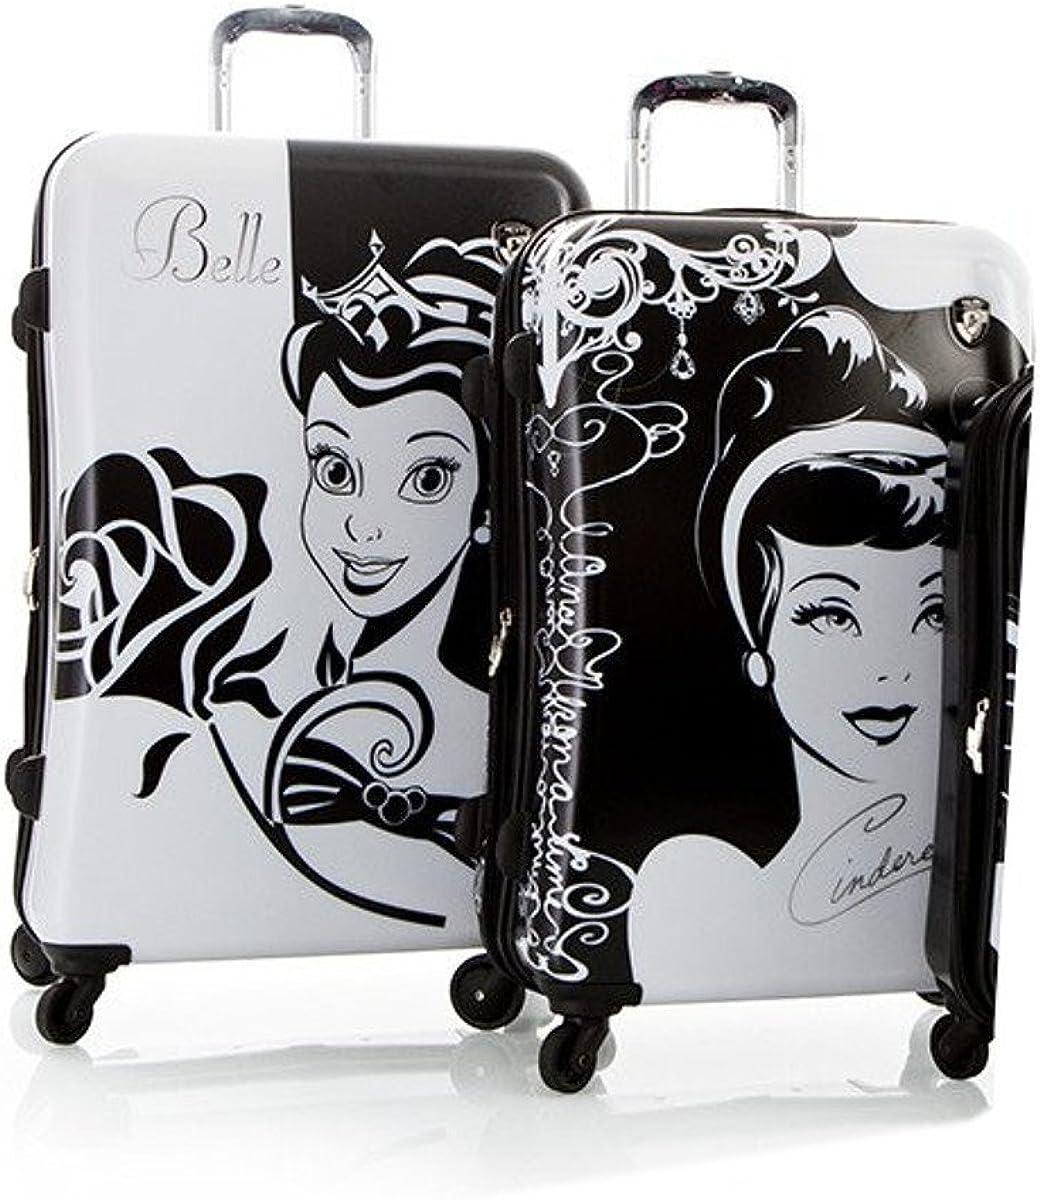 Heys Disney Luggage Set 2-Piece Princess Belle 30 Princess Cinderella 26